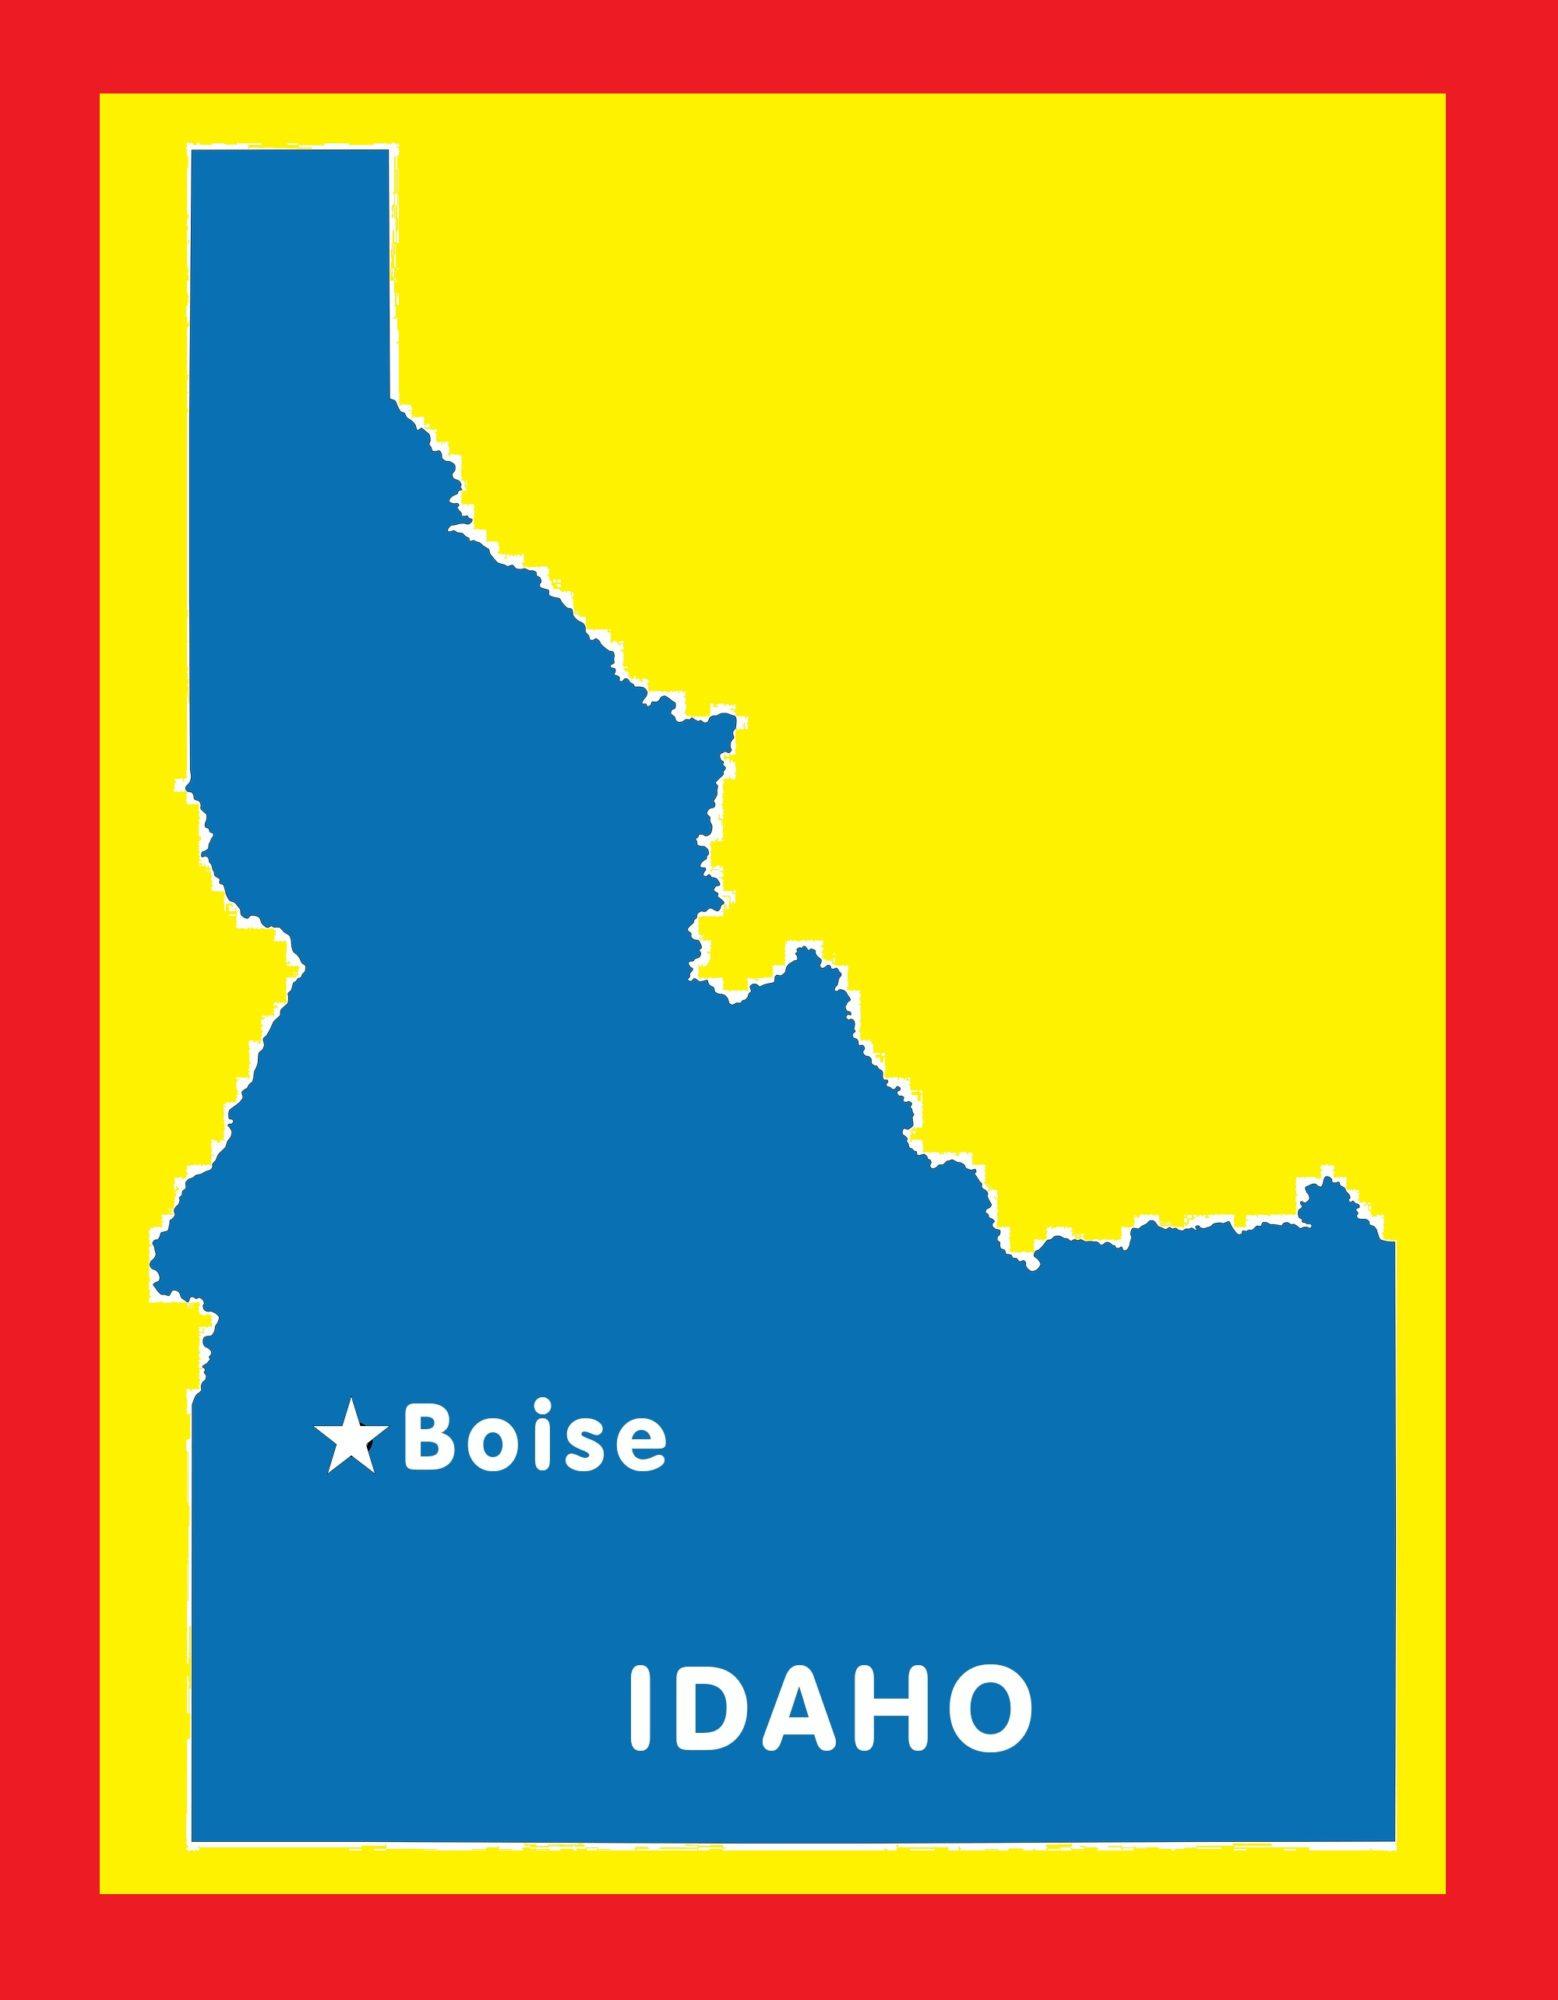 Idaho Capital Map | Large Printable and Standard Map 9